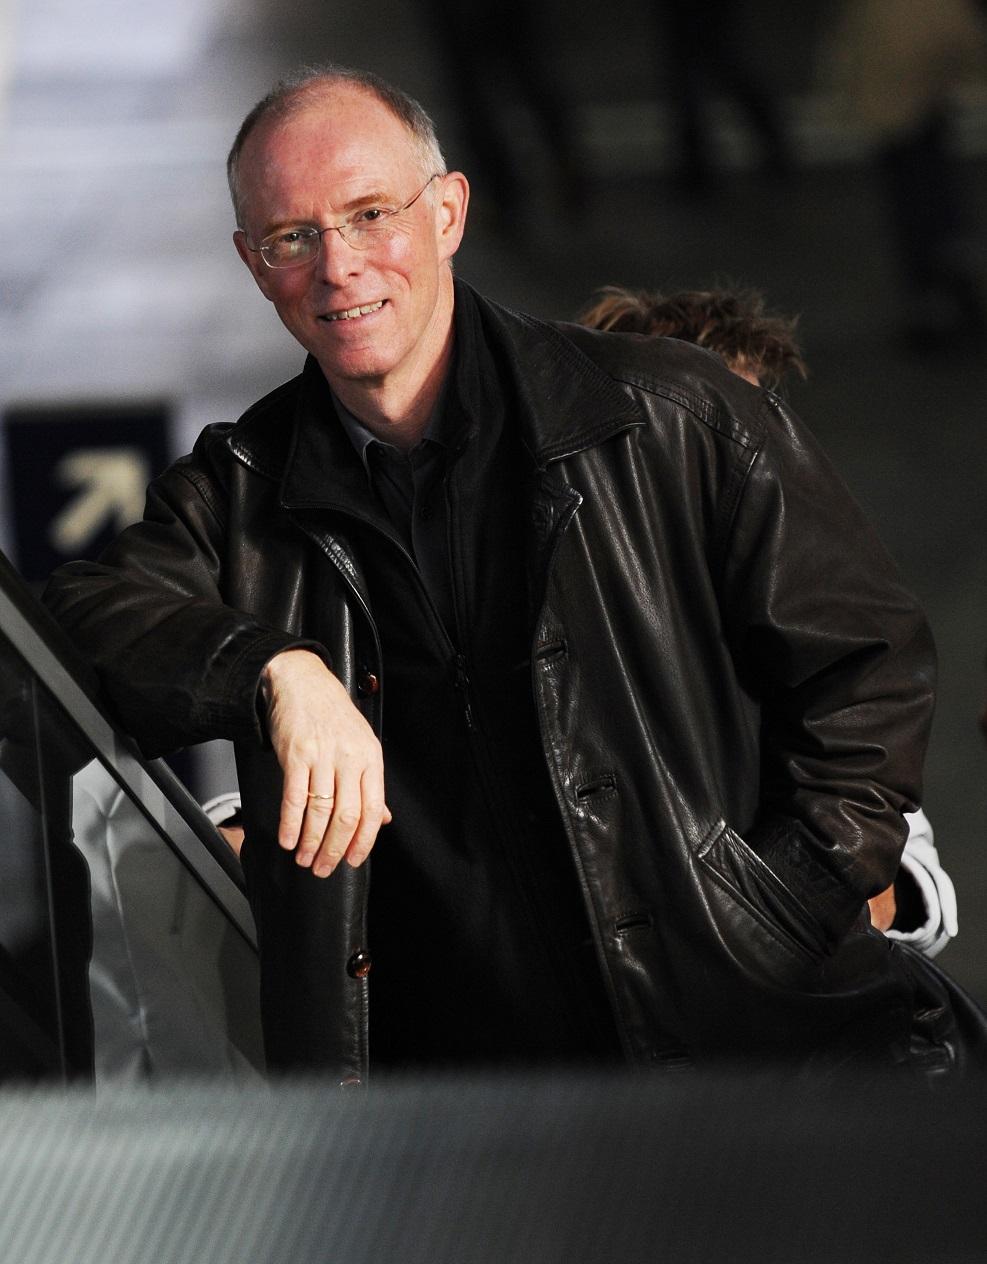 Karl Heinz Brandt